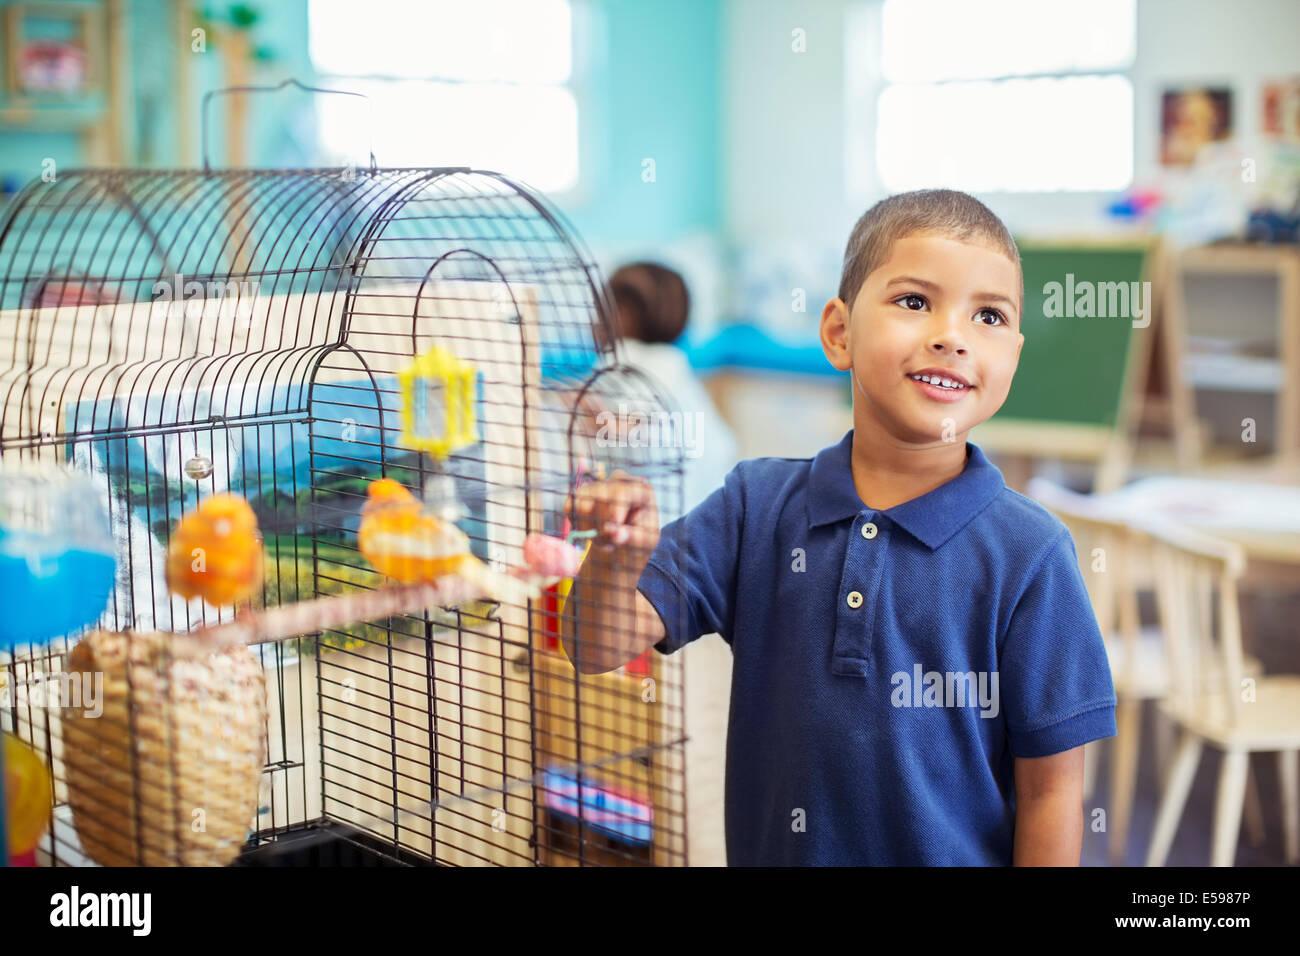 Studente esaminando birdcage in aula Immagini Stock